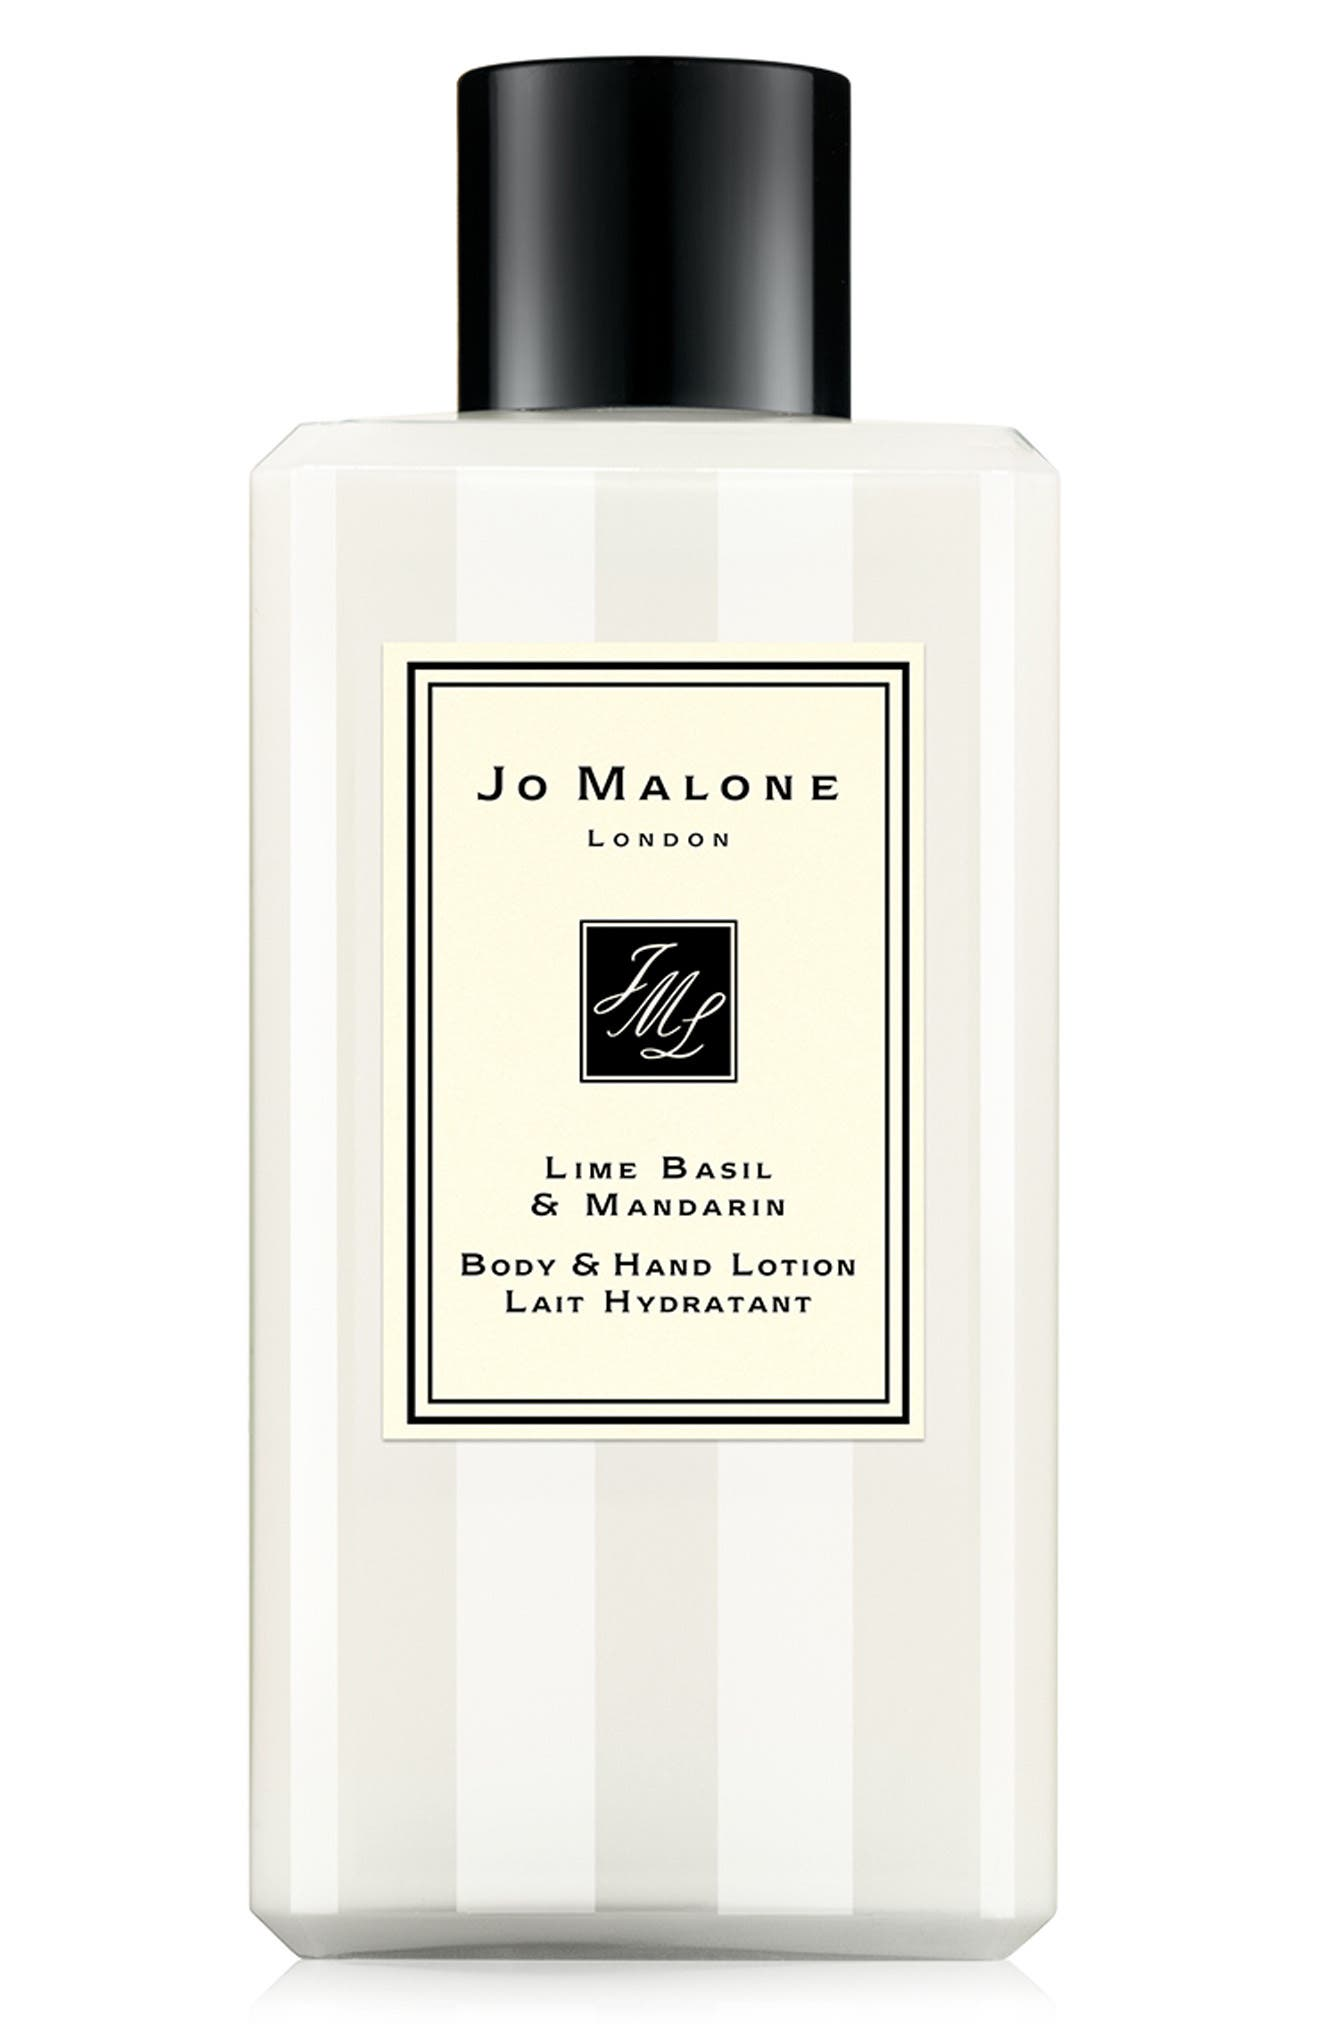 Jo Malone London(TM) Lime Basil & Mandarin Body Lotion